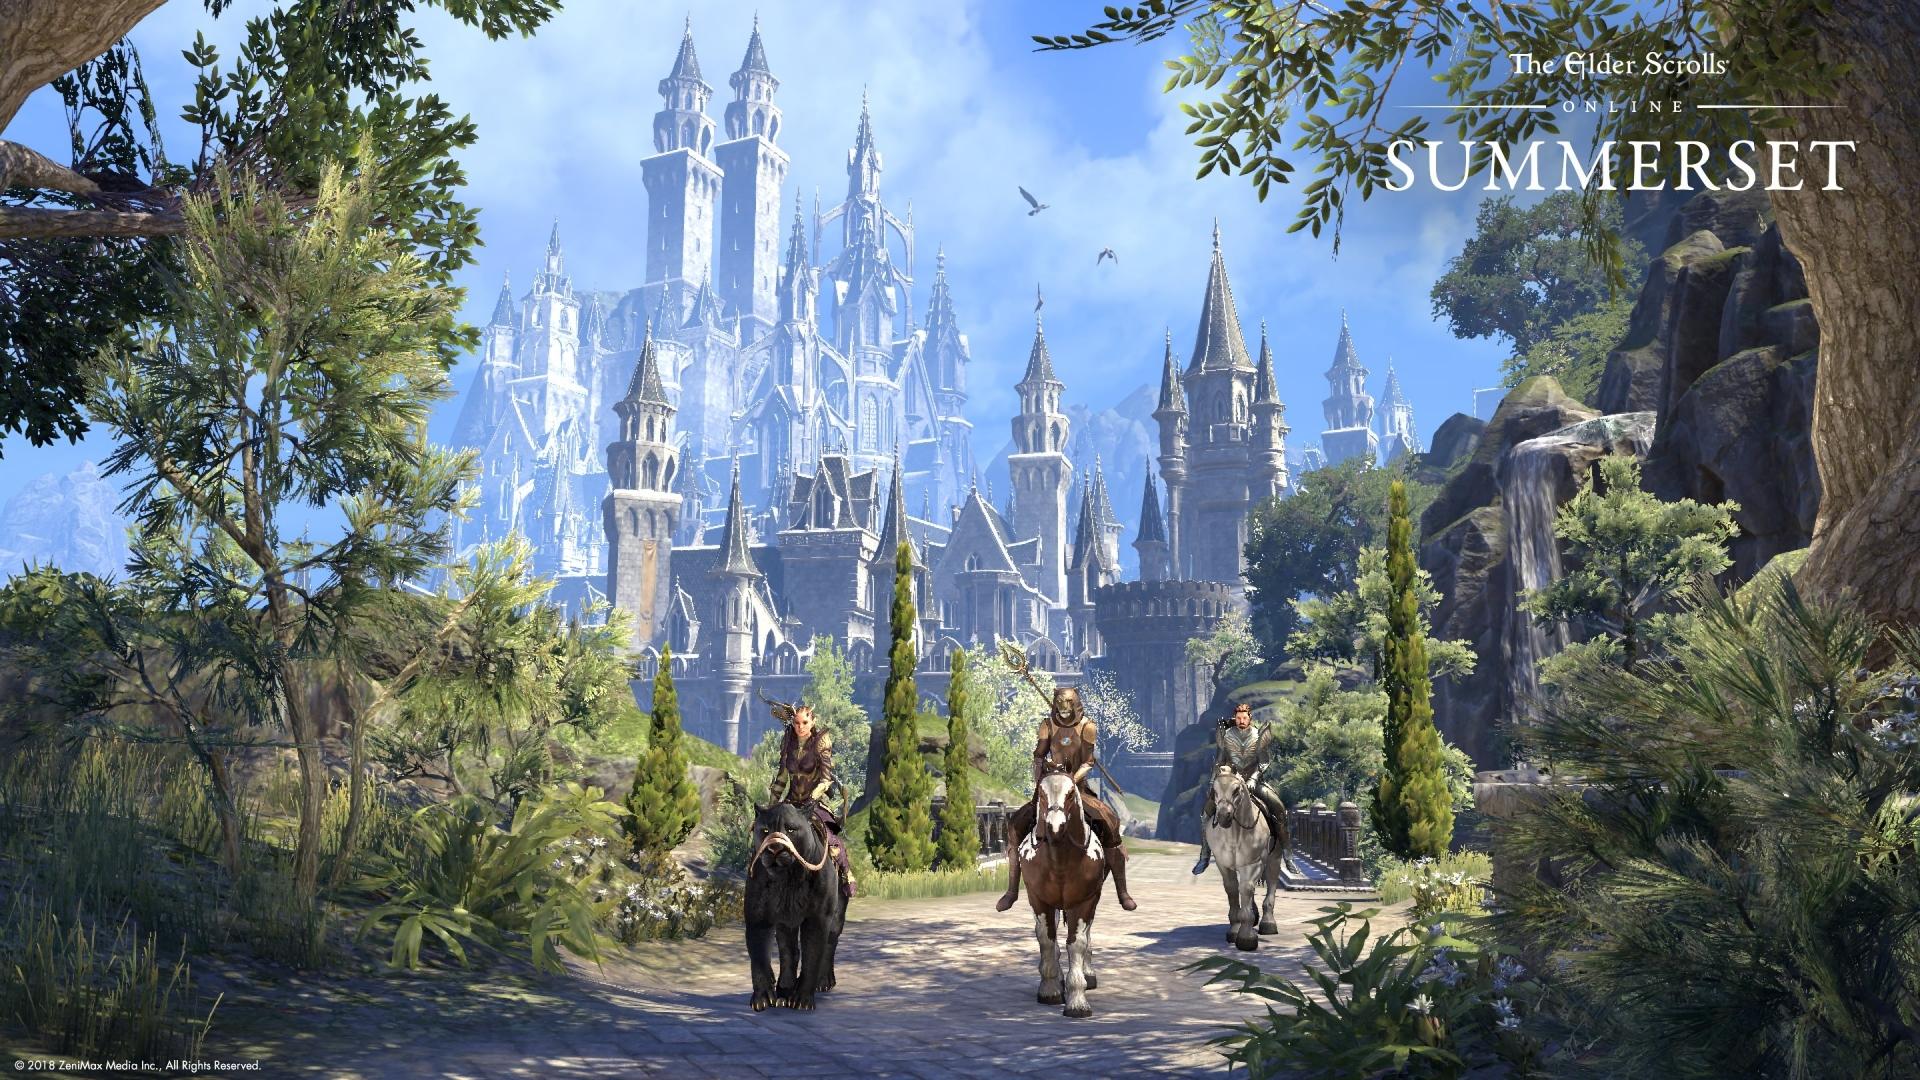 Summerset The Elder Scrolls Online Tamriel Unlimited Xbox One PS4 PC Review Test Kritik Malerische Umgebung